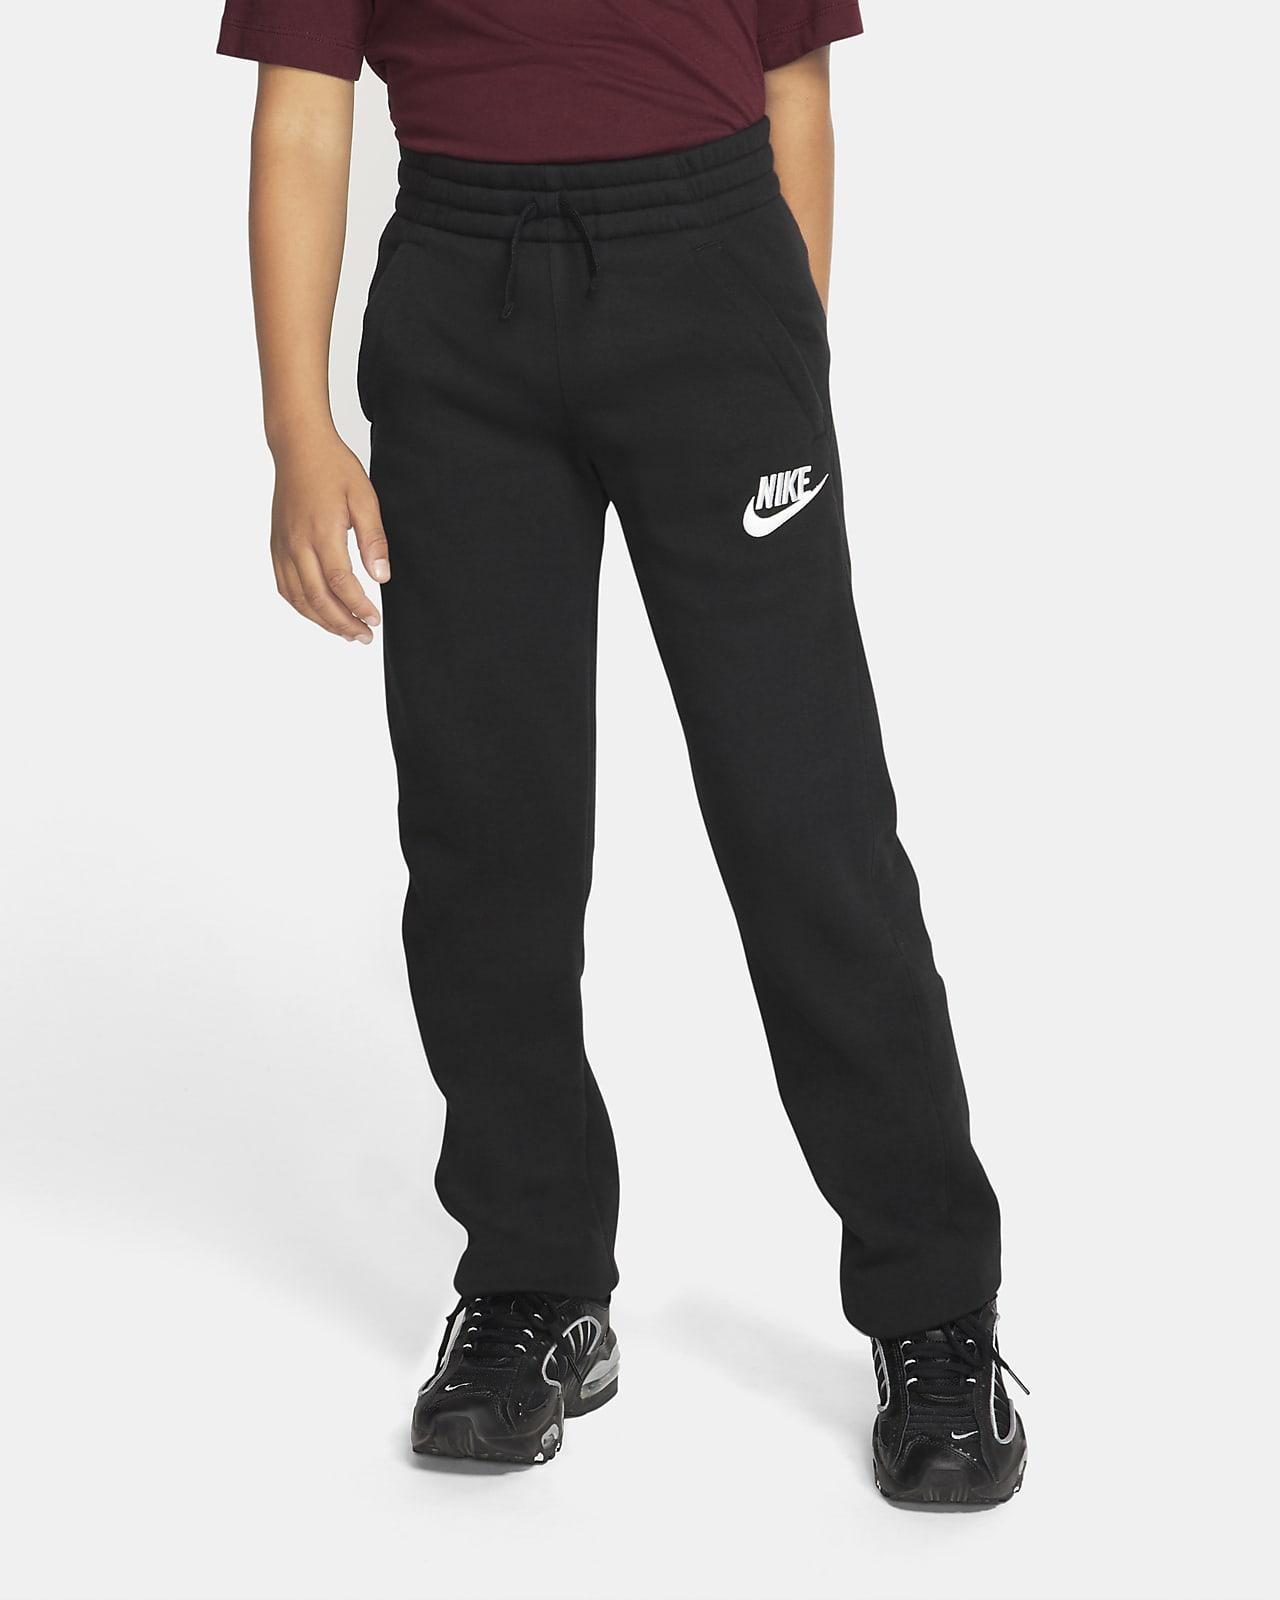 Kids Boys Girls Sports Jogging Pants Joggers Kids Bottom Sweatpants Sportwear